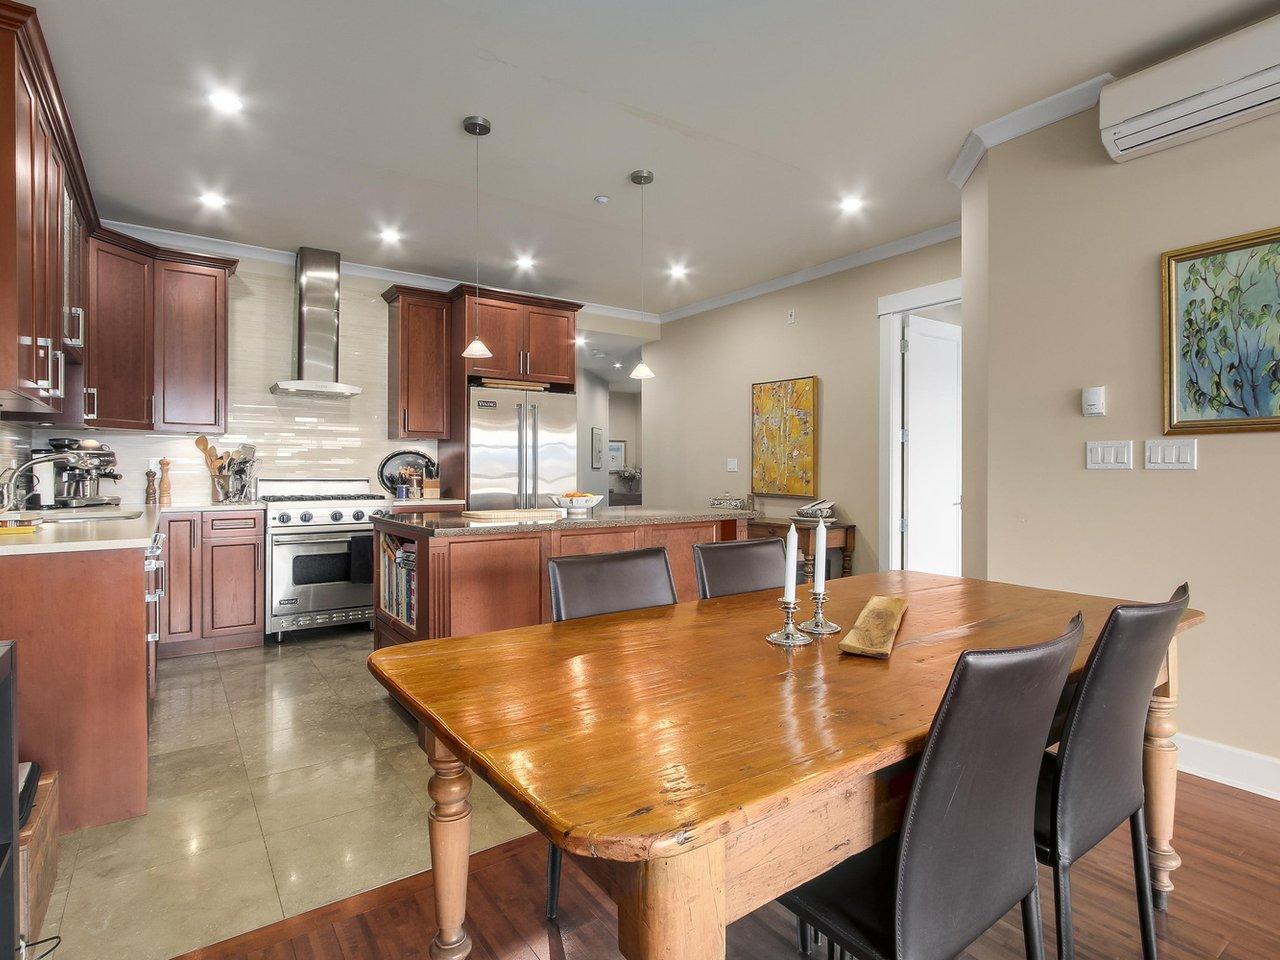 West Vancouver,BC,Canada,2 Bedrooms Bedrooms,2 BathroomsBathrooms,Apartment,1315